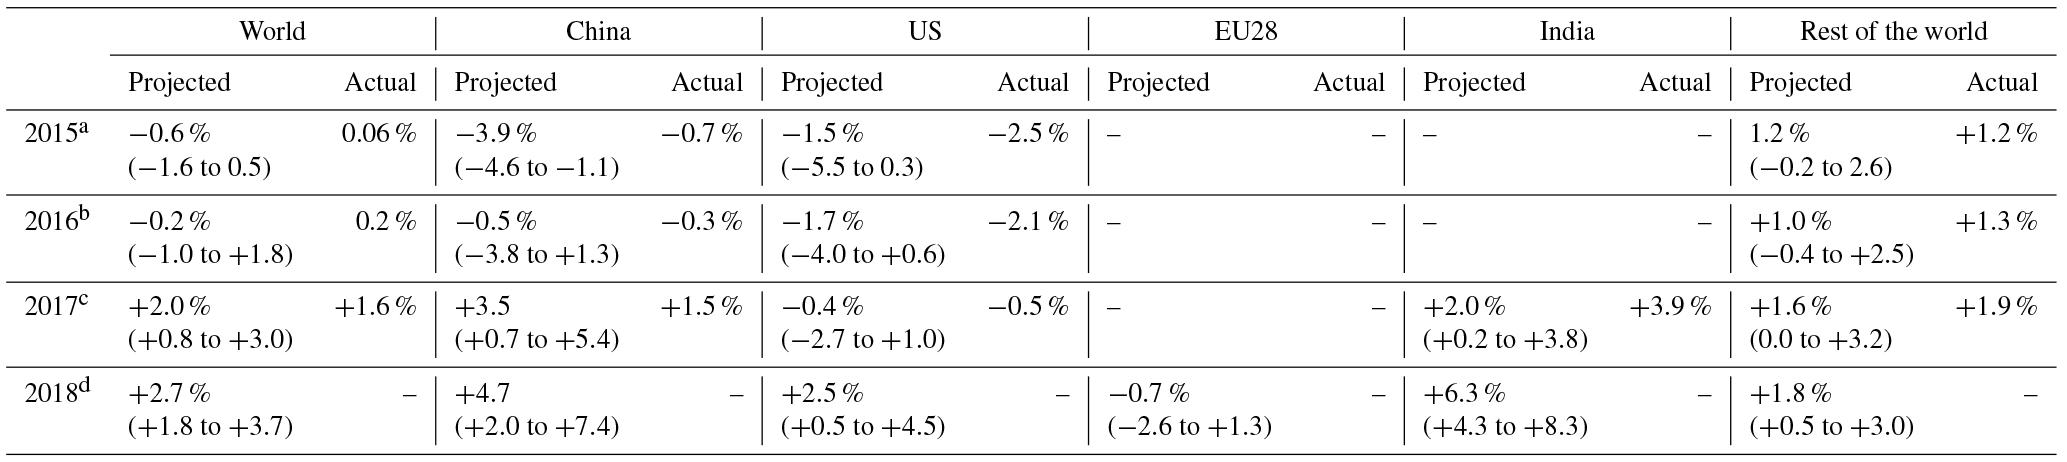 ESSD - Global Carbon Budget 2018